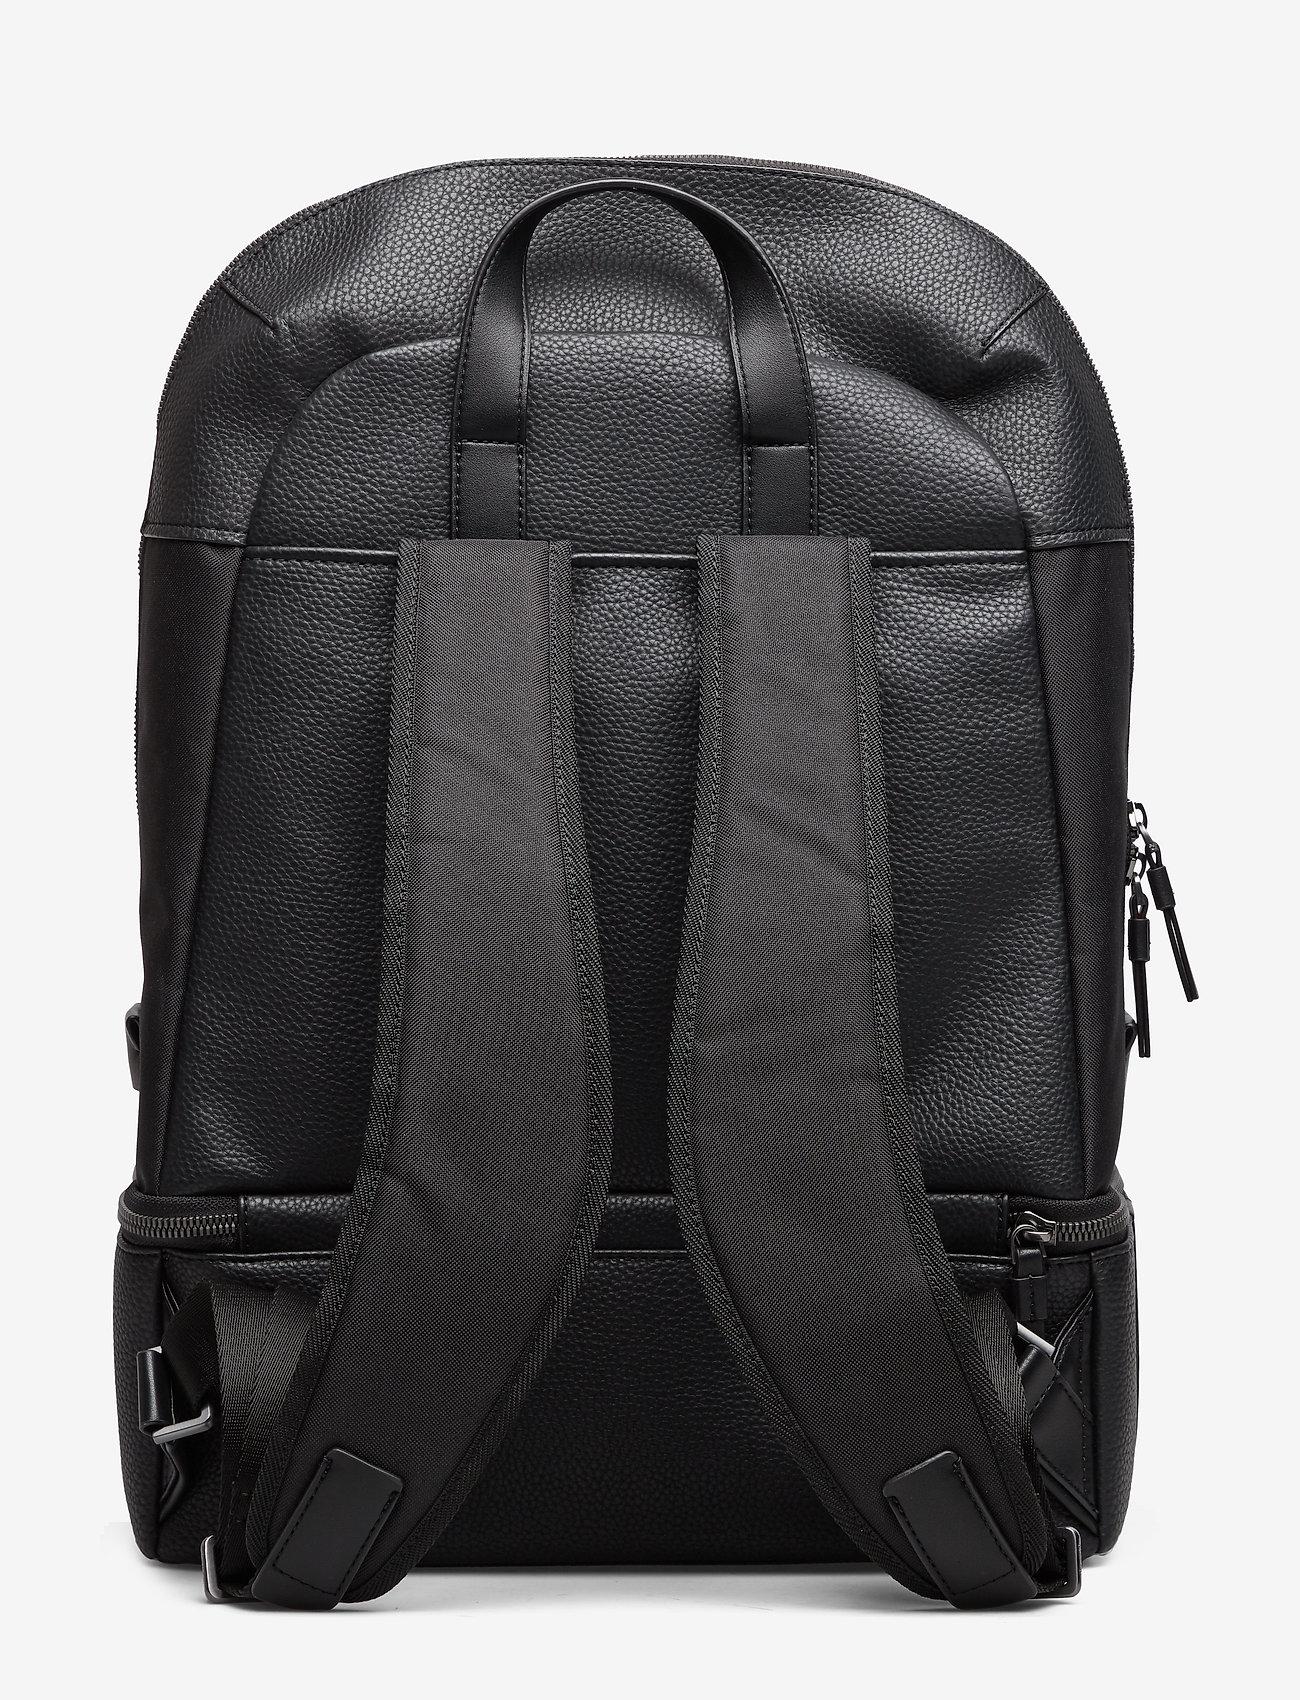 Vault Backpack (Black) - Calvin Klein ErGsxB